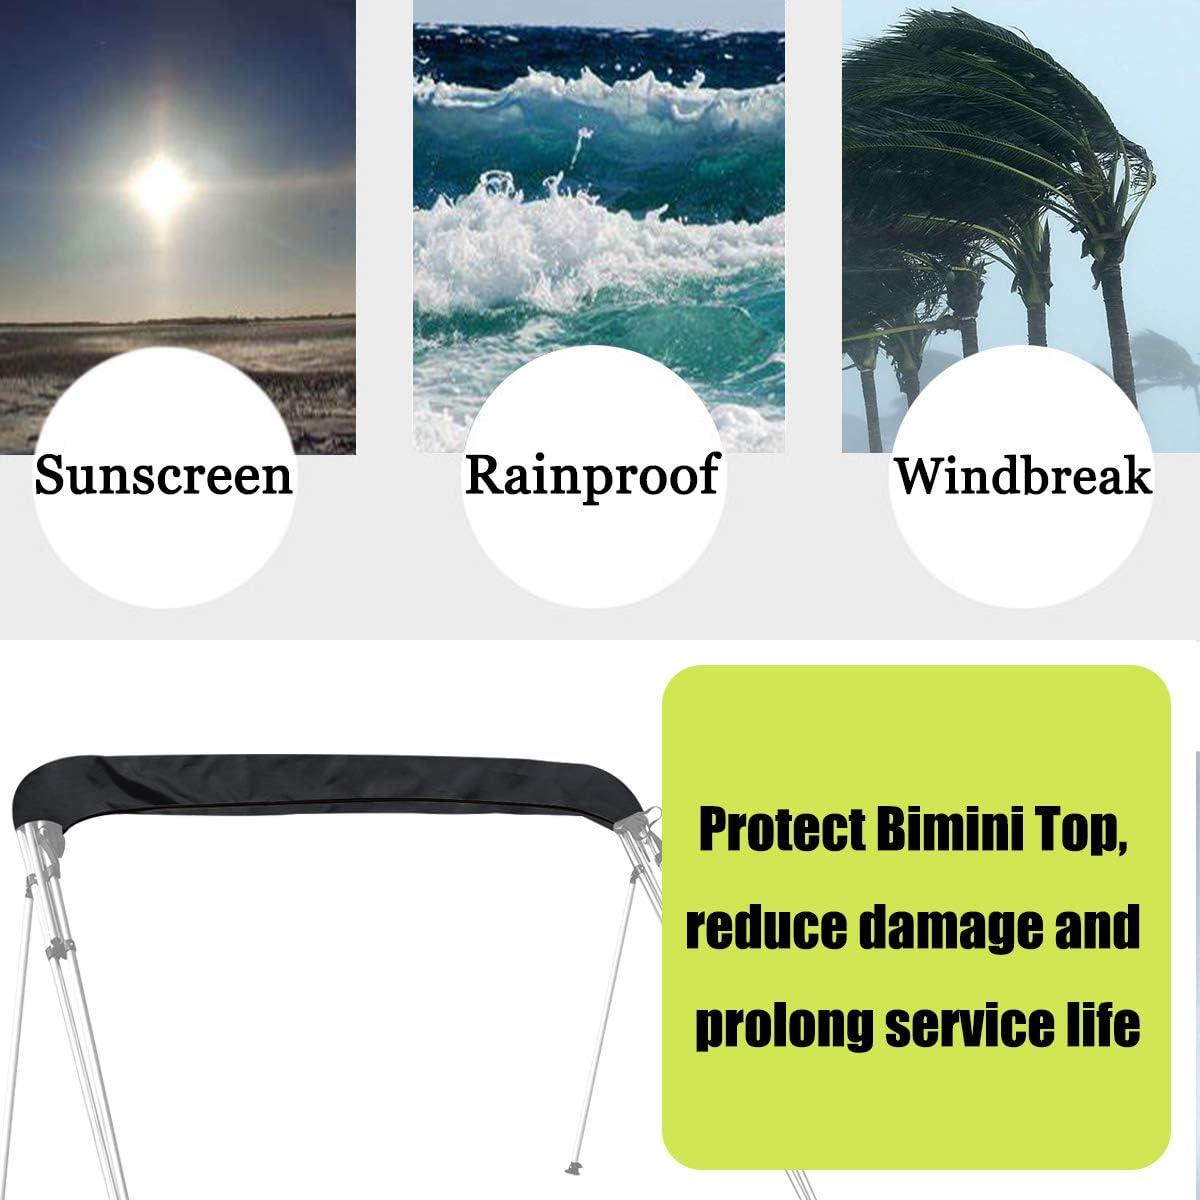 sea Water and sea Breeze in Summer,Storage Boot SoGuDio Bimini Top Cover,Suitable for 3-4 Bows Bimini Tops,Effectively Prevent The Erosion of UV